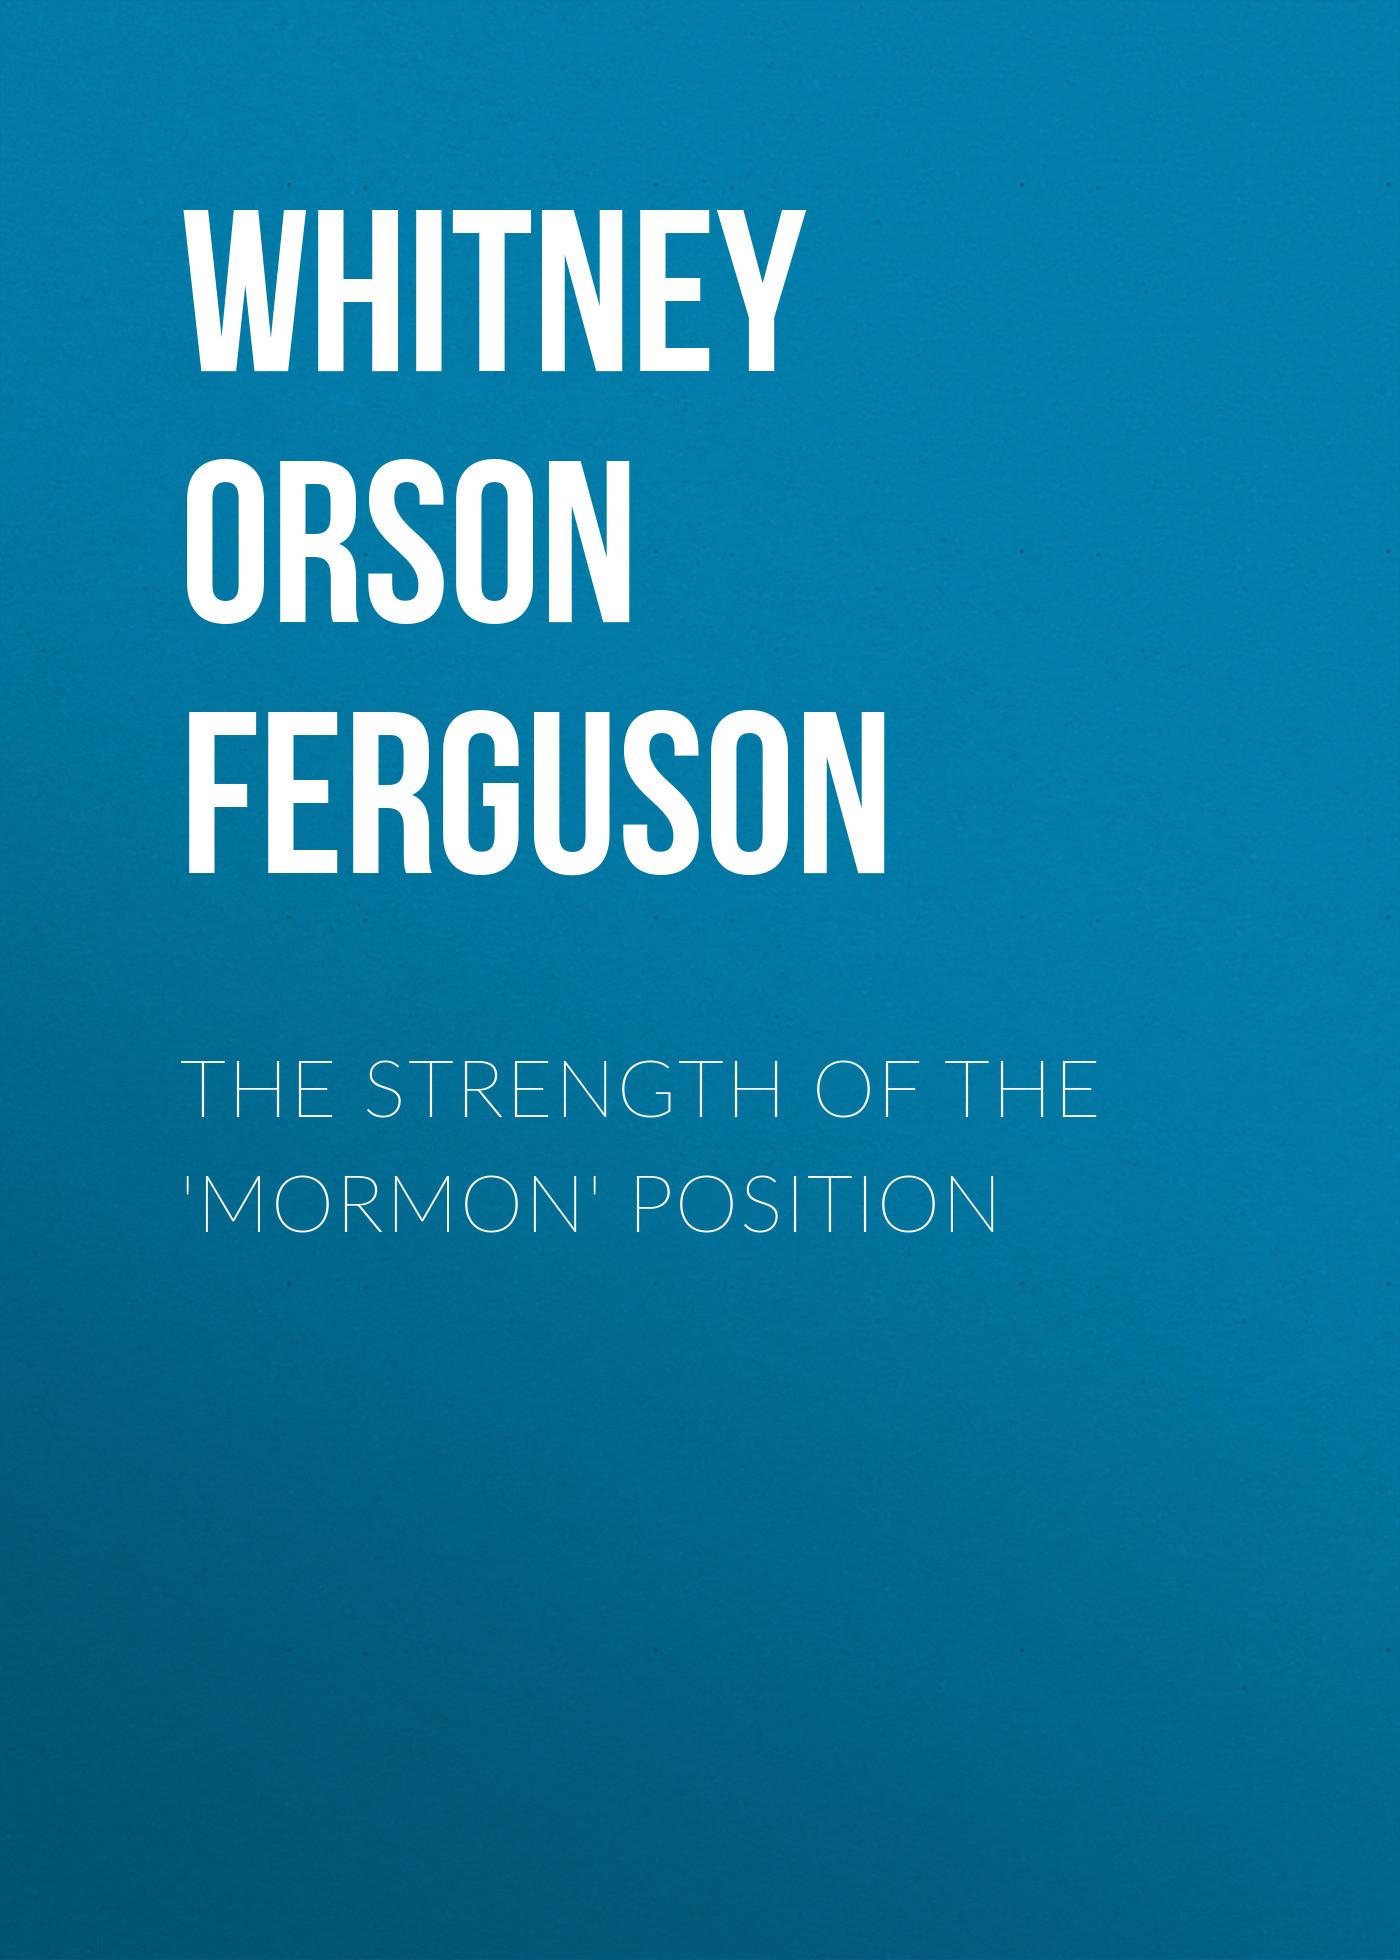 Whitney Orson Ferguson The Strength of the 'Mormon' Position the book of mormon vancouver